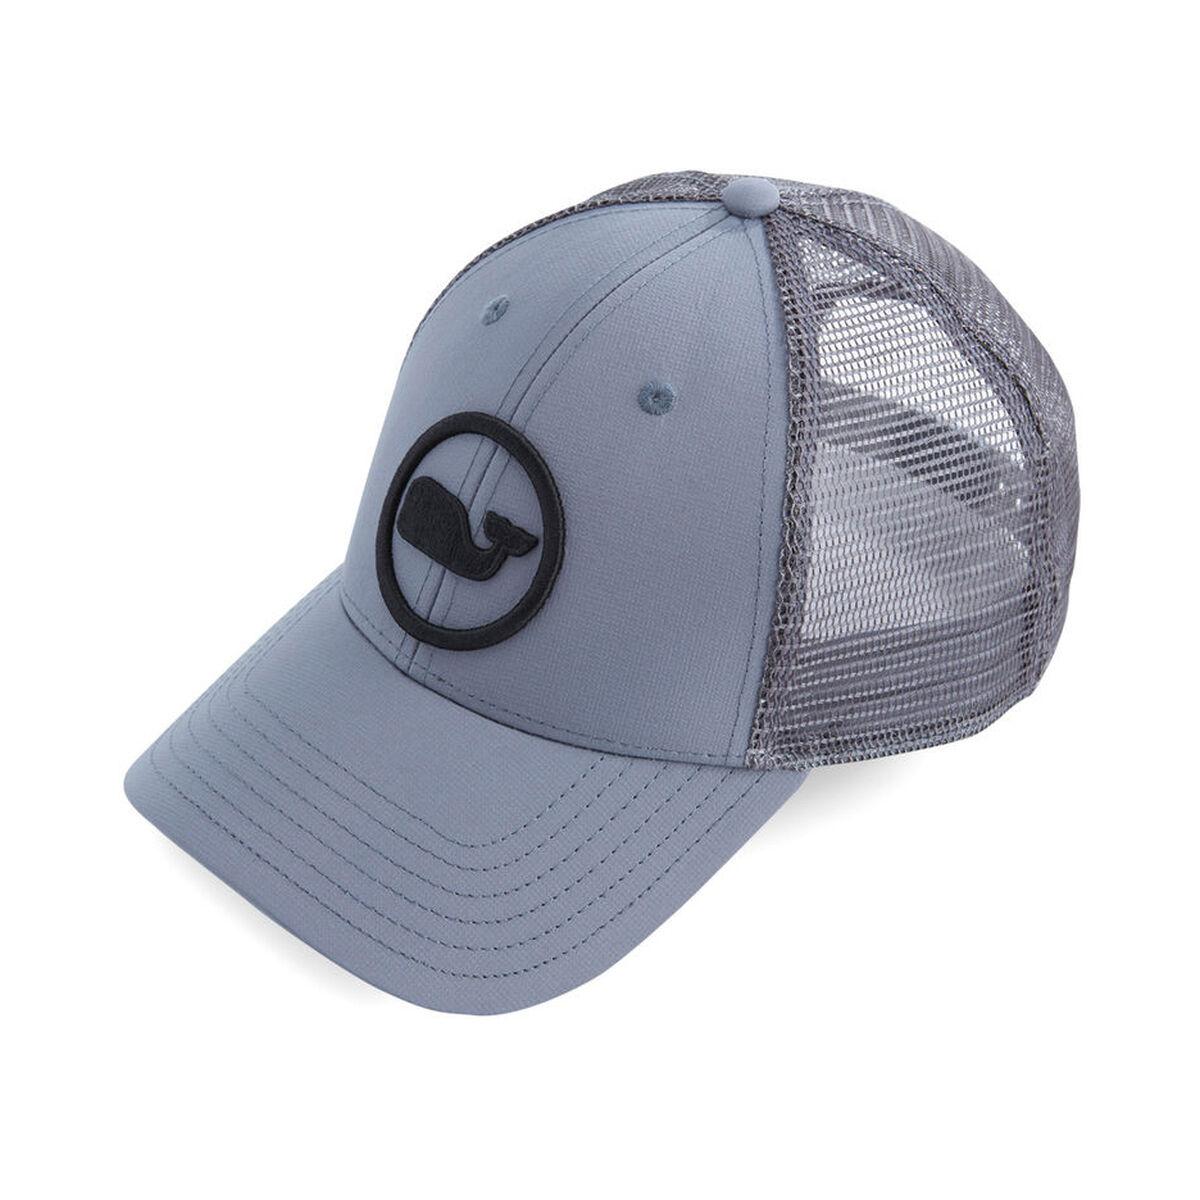 Images. Vineyard Vines Whale Dot Performance Trucker Hat fc9f5227b4a